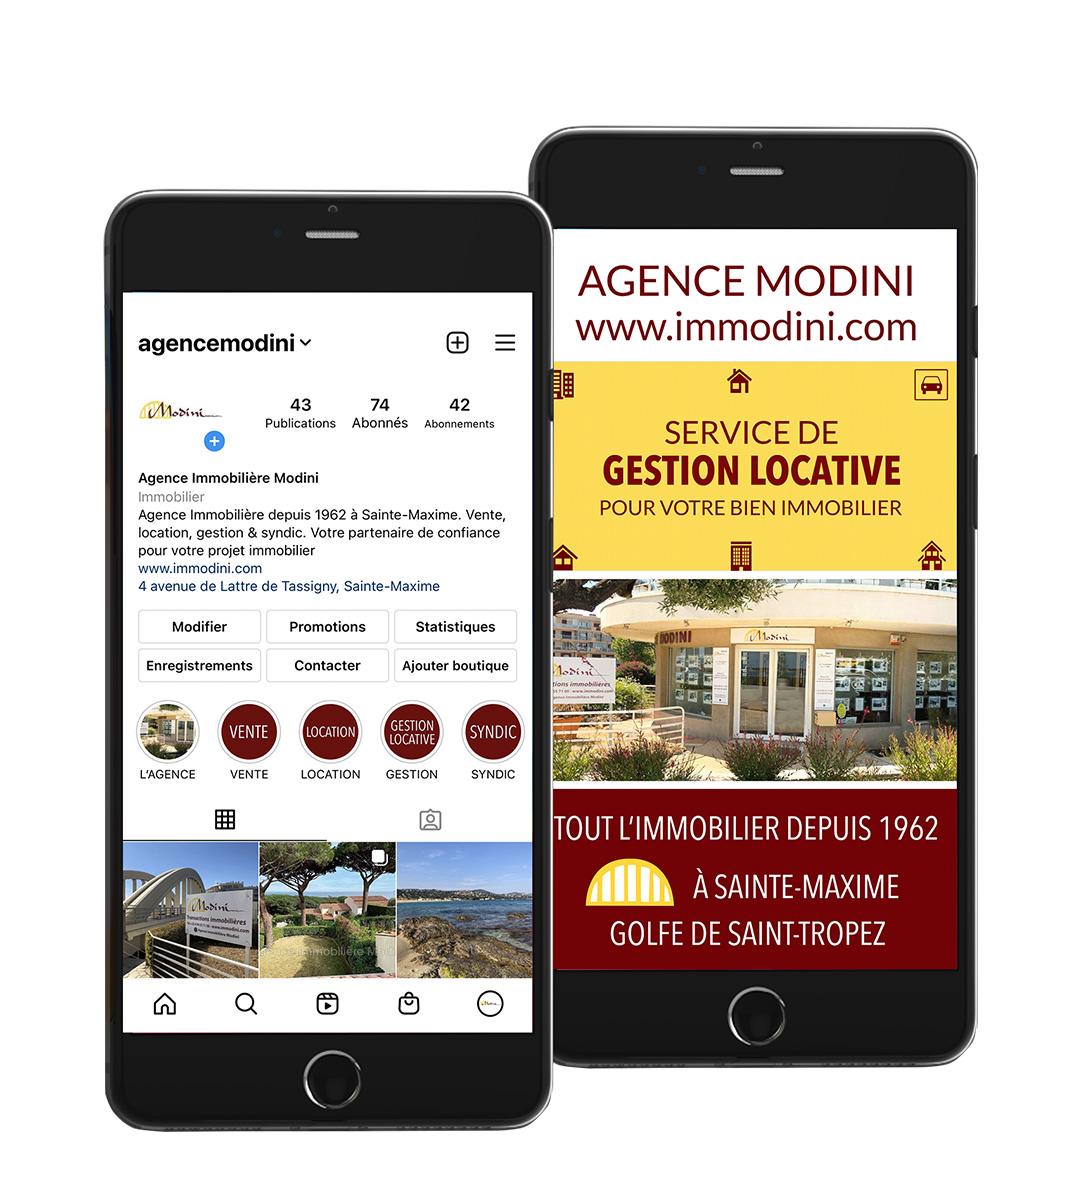 digykan communication digitale instagram Agence Immobilière Modini visuel